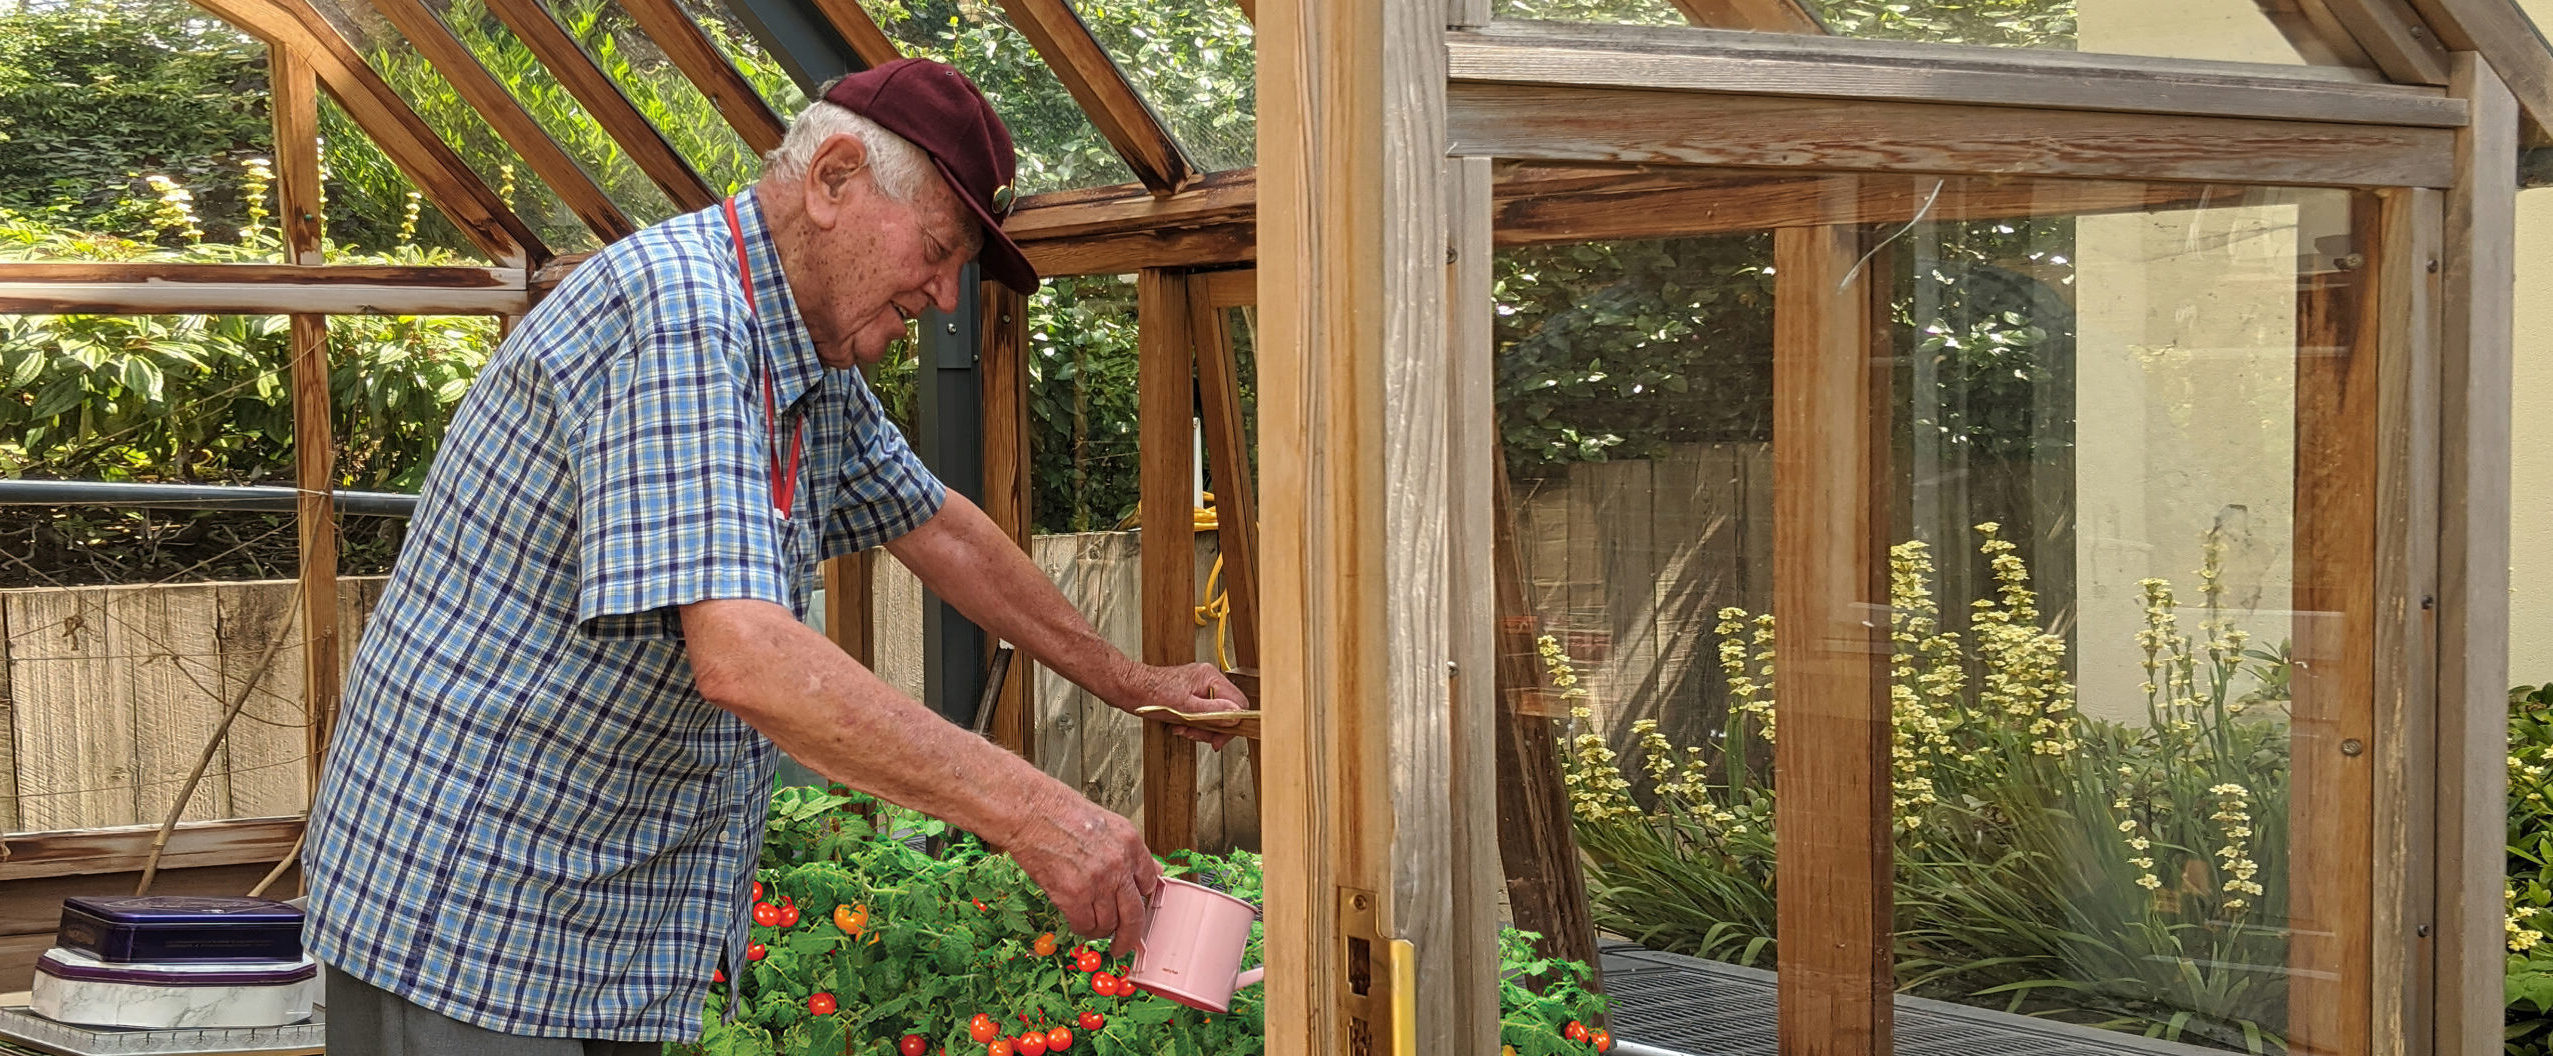 Gardening in Care Home, Burbage, Hinckley